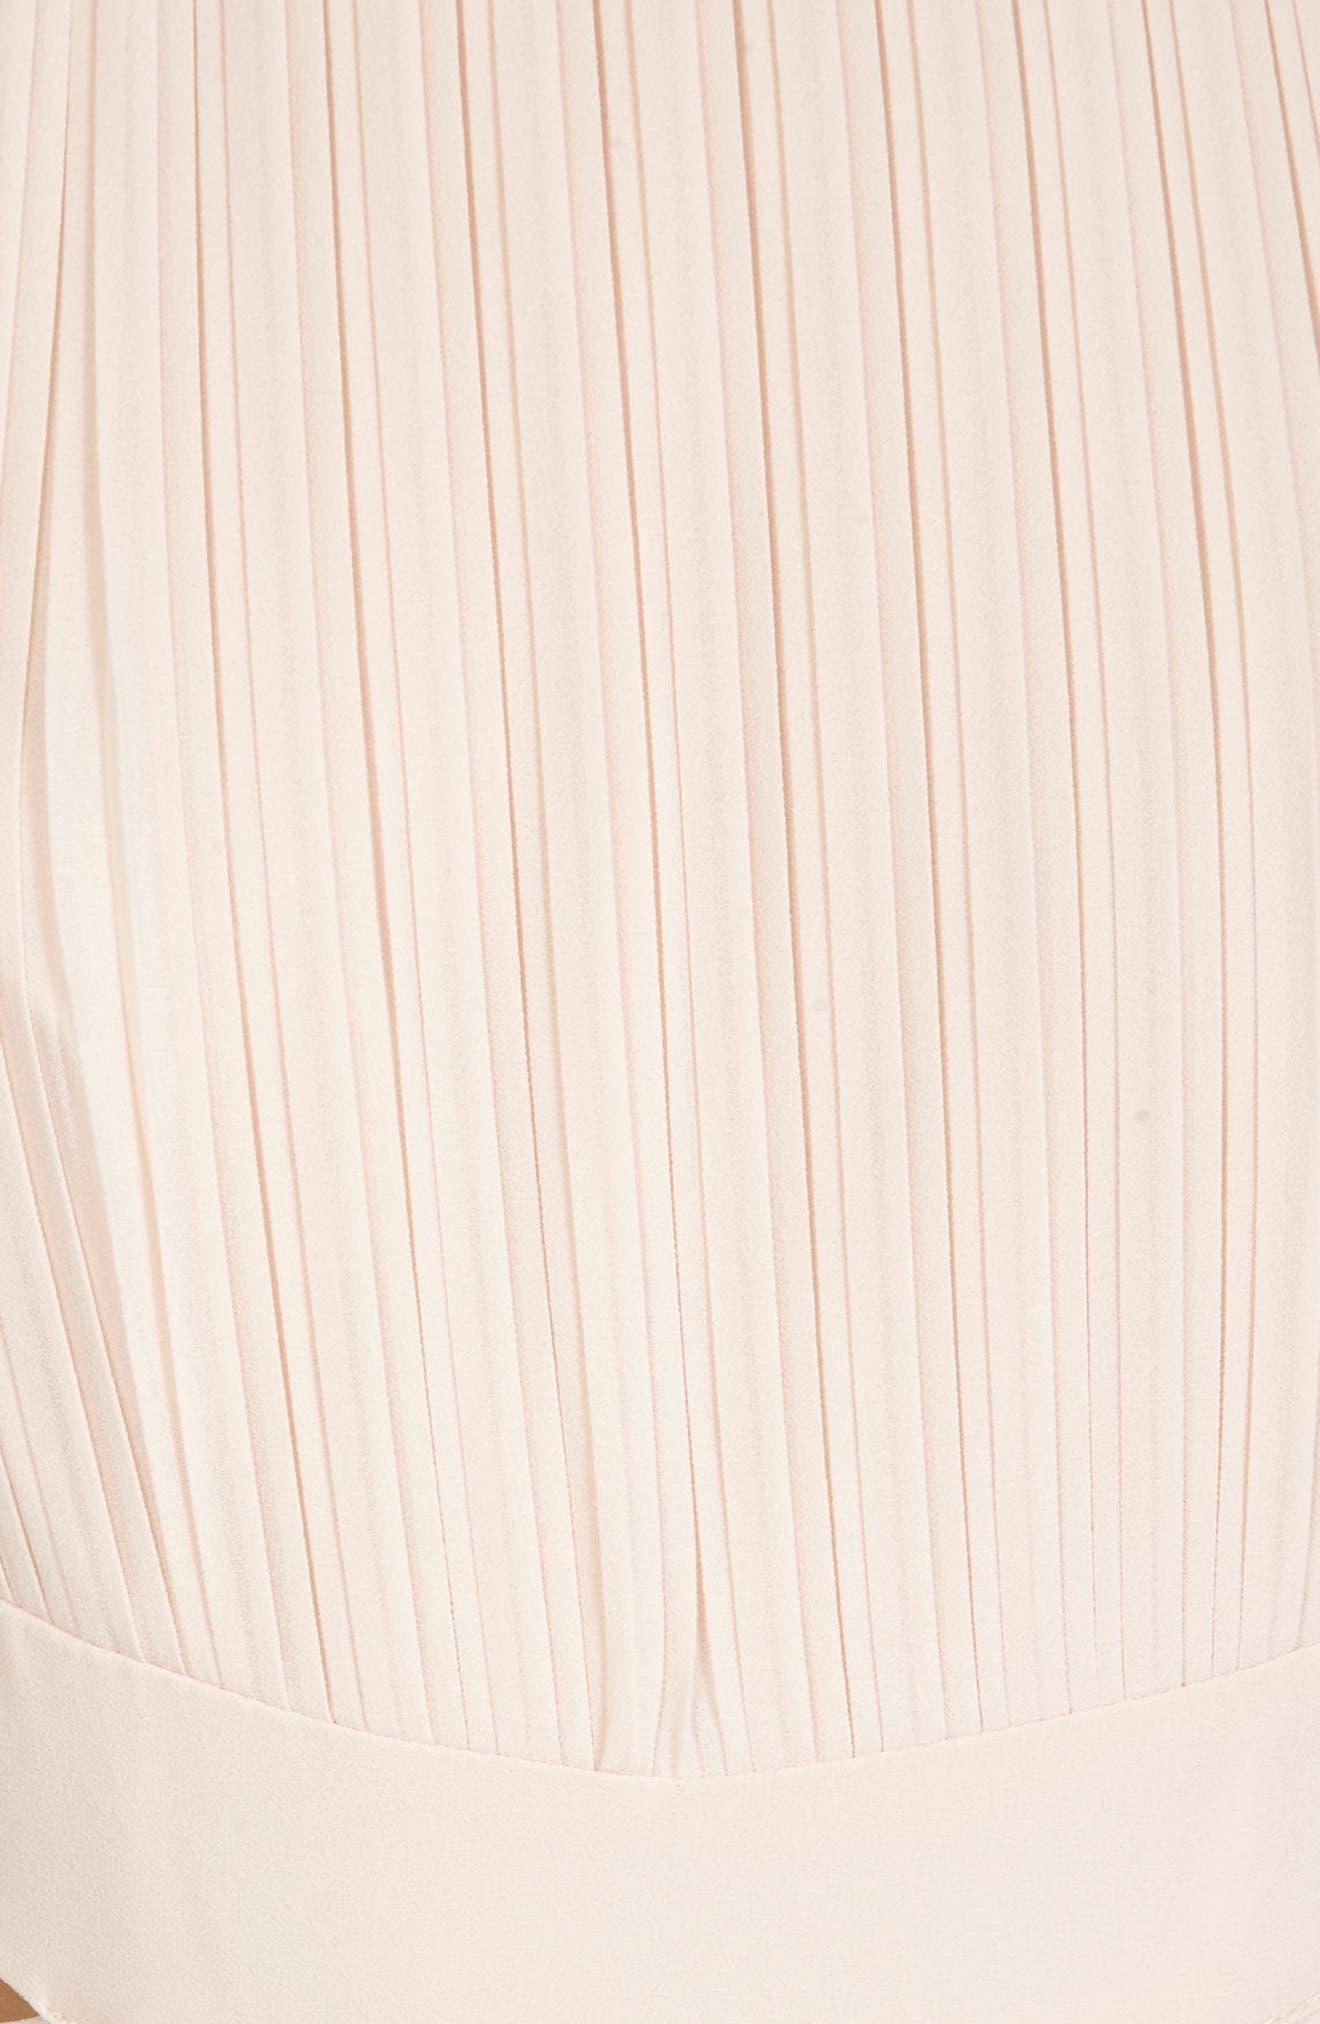 Boston Cutout Maxi Dress,                             Alternate thumbnail 4, color,                             Nude